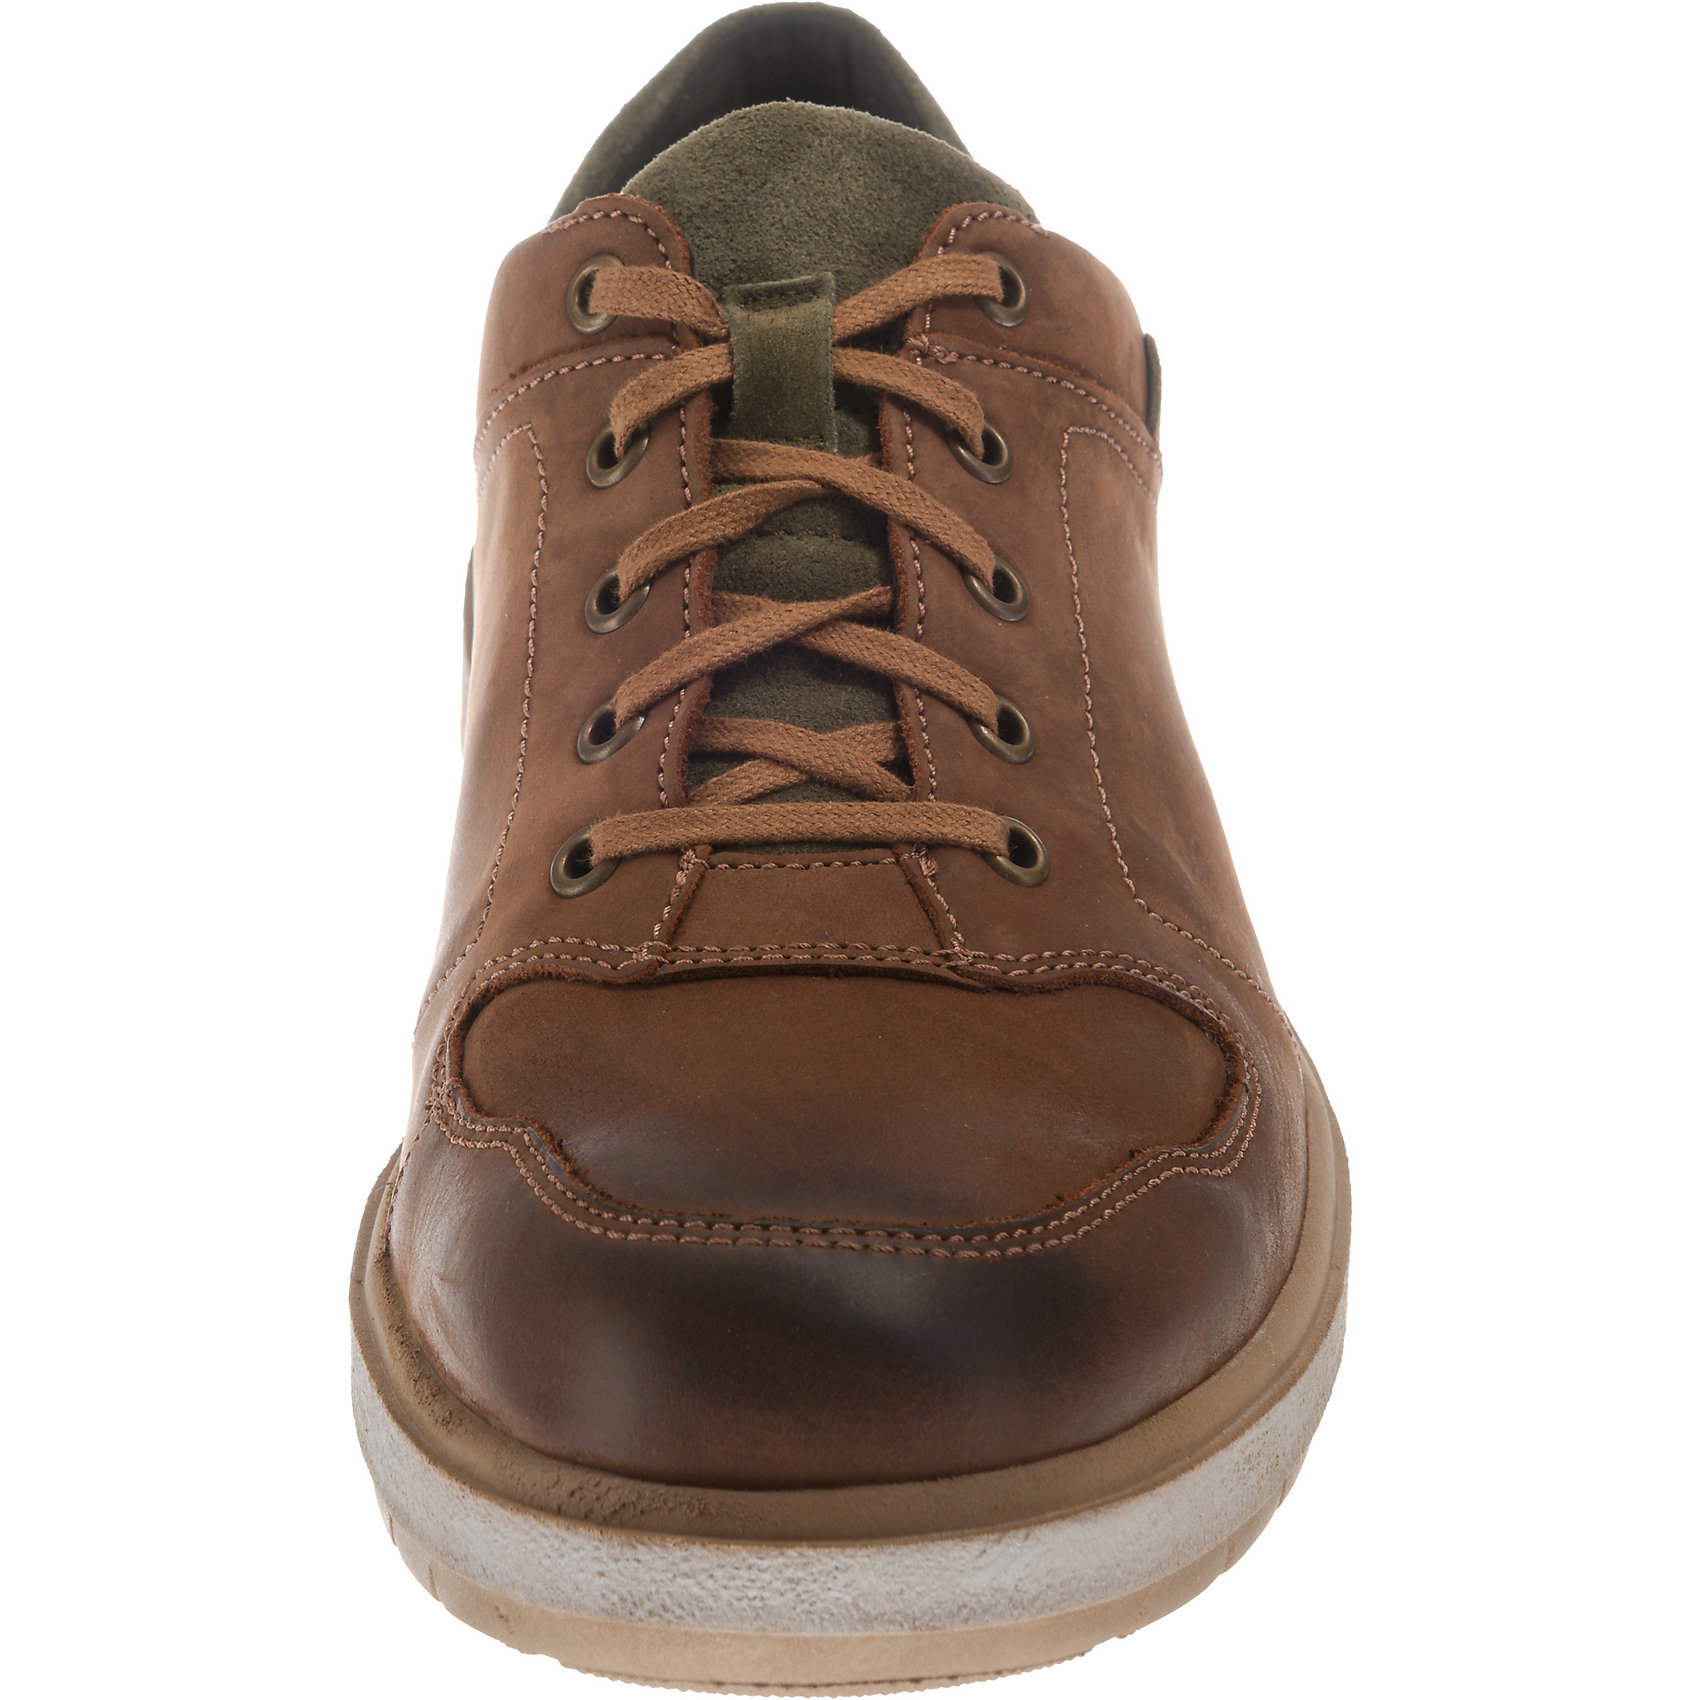 Sneakers Herren Braun Josef kombi Seibel Rudi 8551372 Für Low 43 Neu S45Acq3RjL